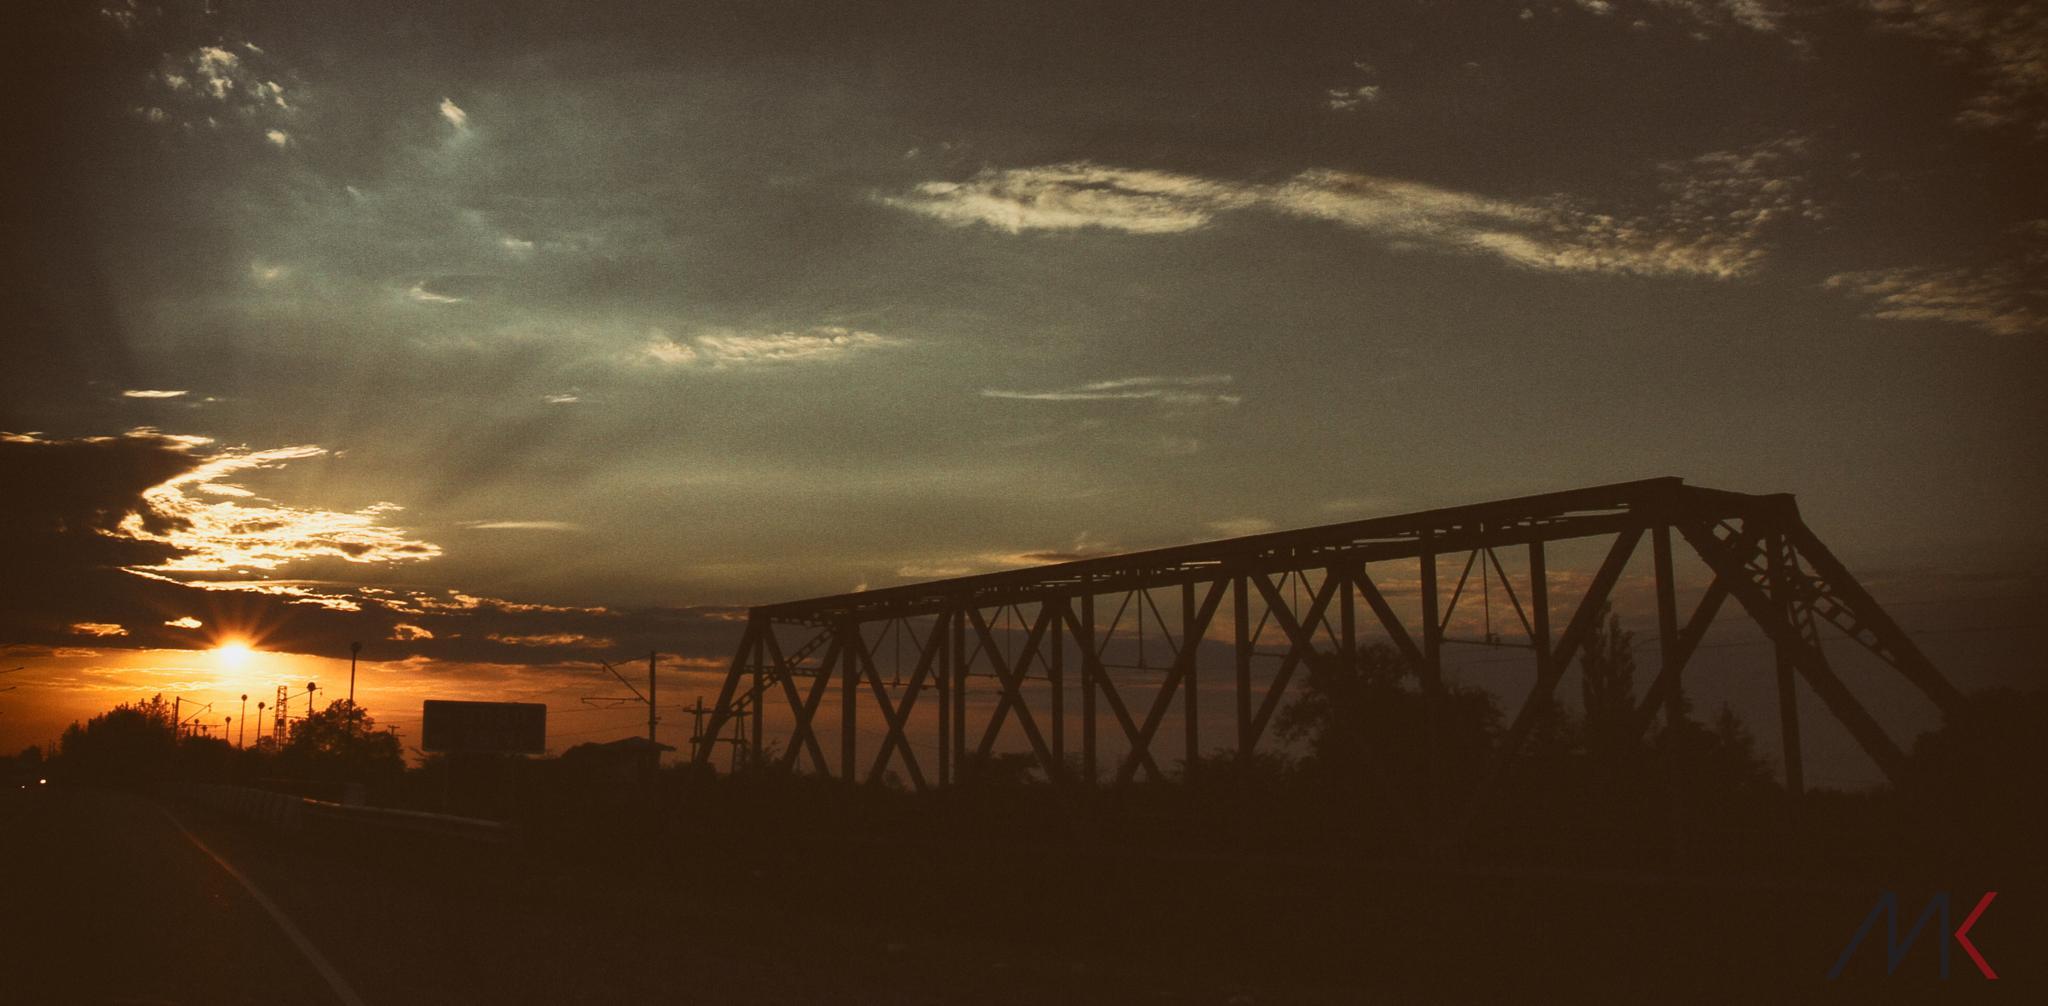 sunset by Makho Kipshidze